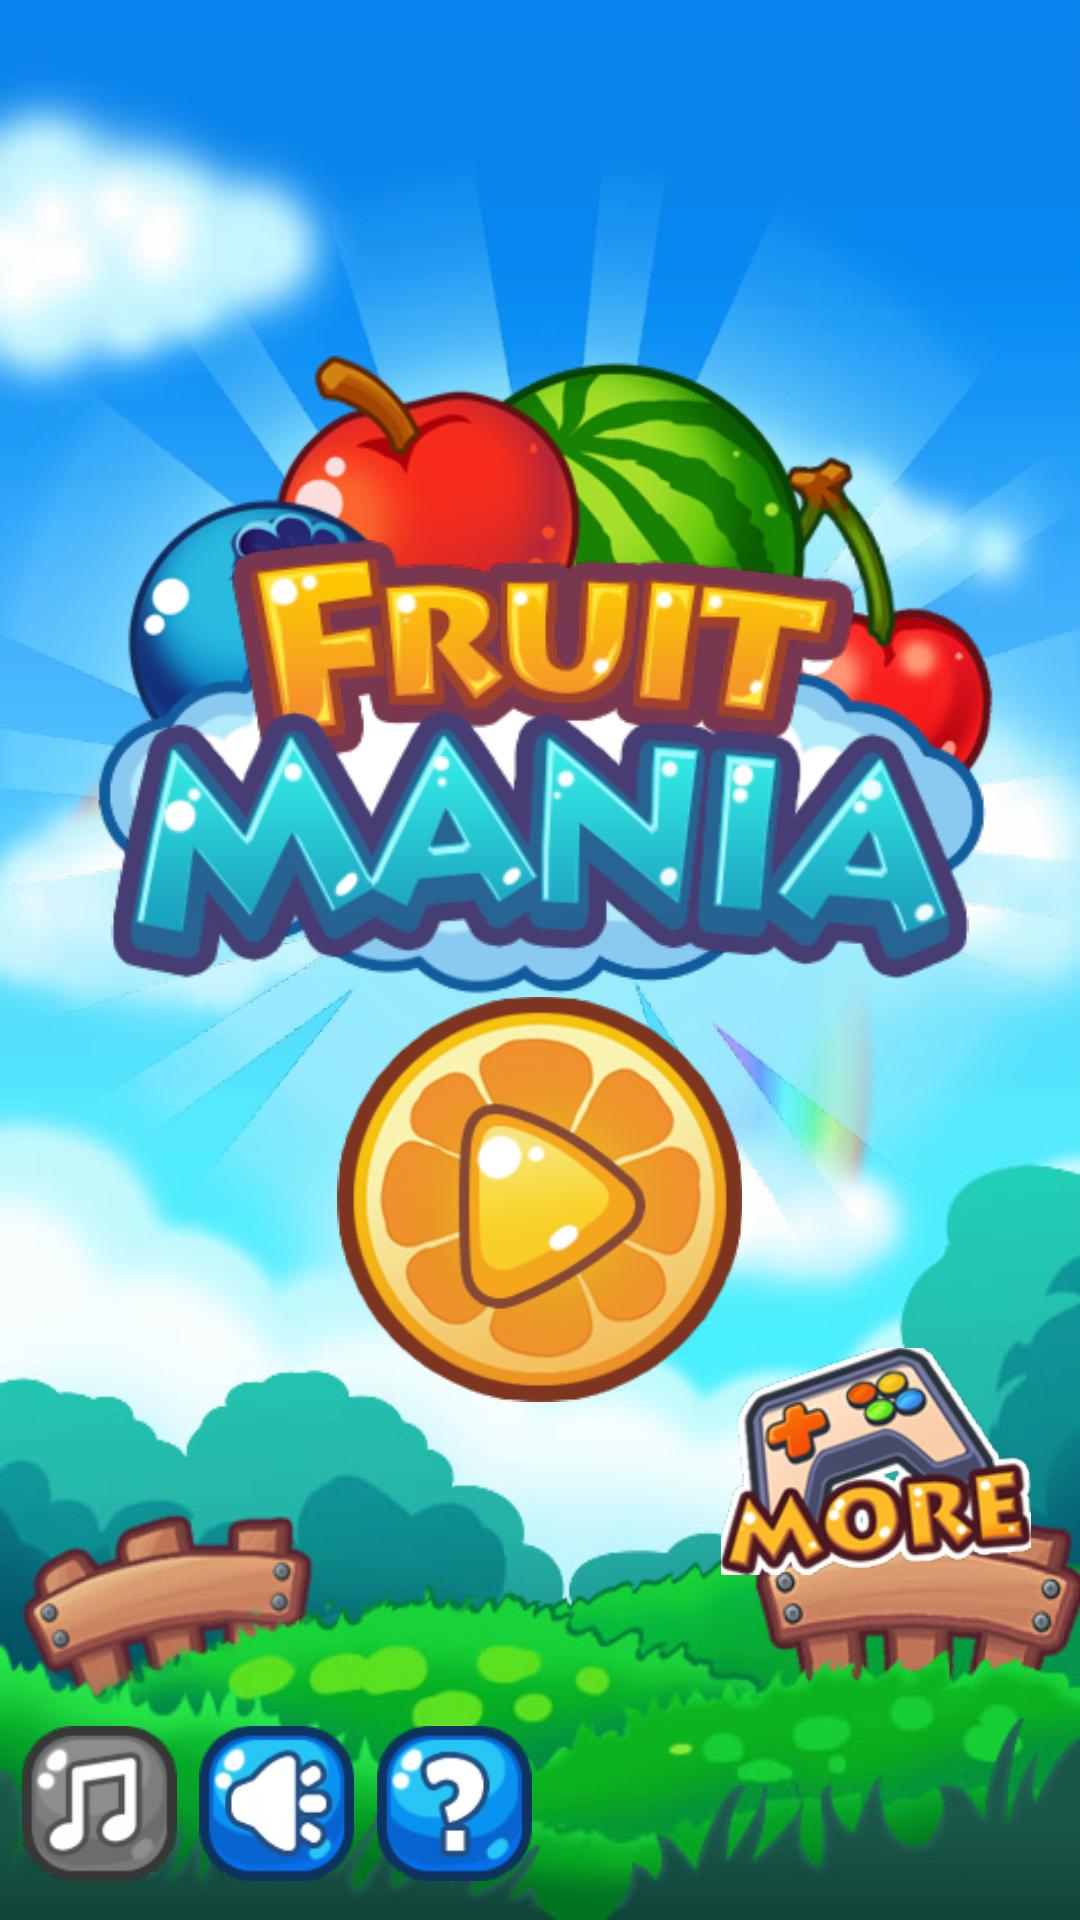 Fruits Mania Game